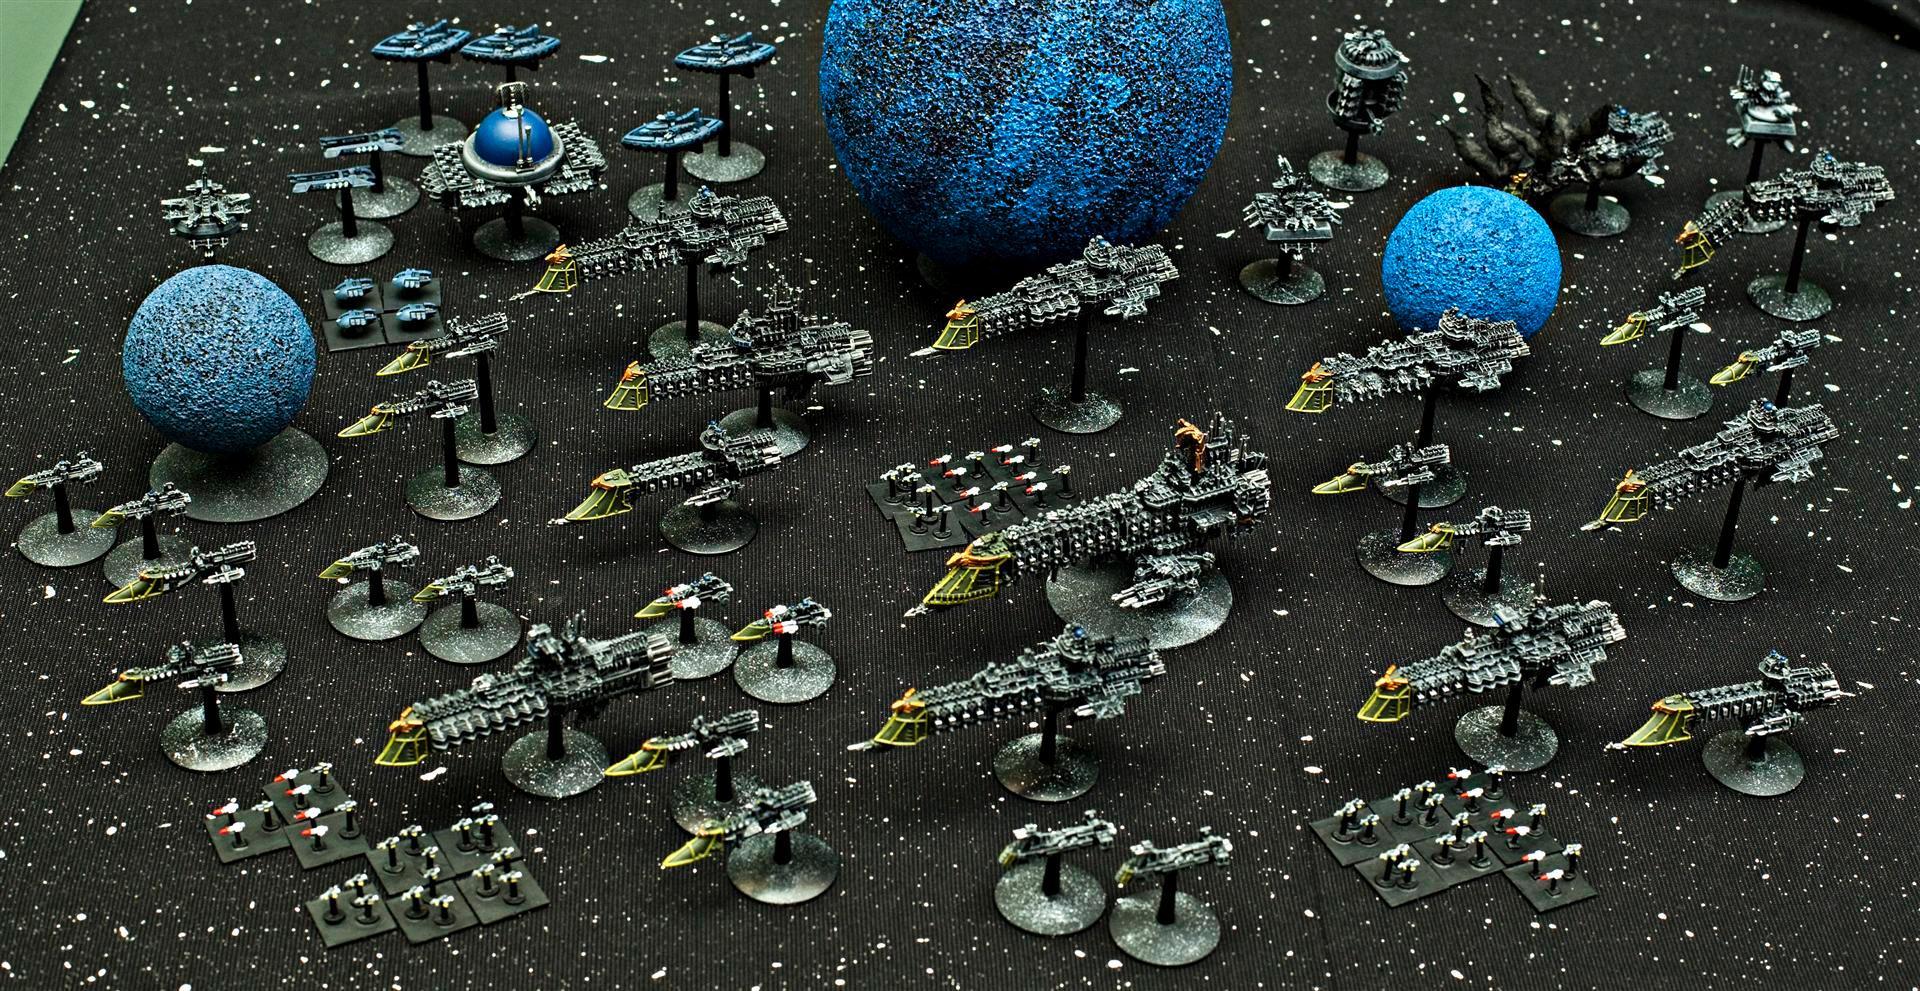 Battlecruiser, Battlefleet Gothic, Battleship, Cruiser, Escort, Fleet, Imperial, Imperials, Space Station